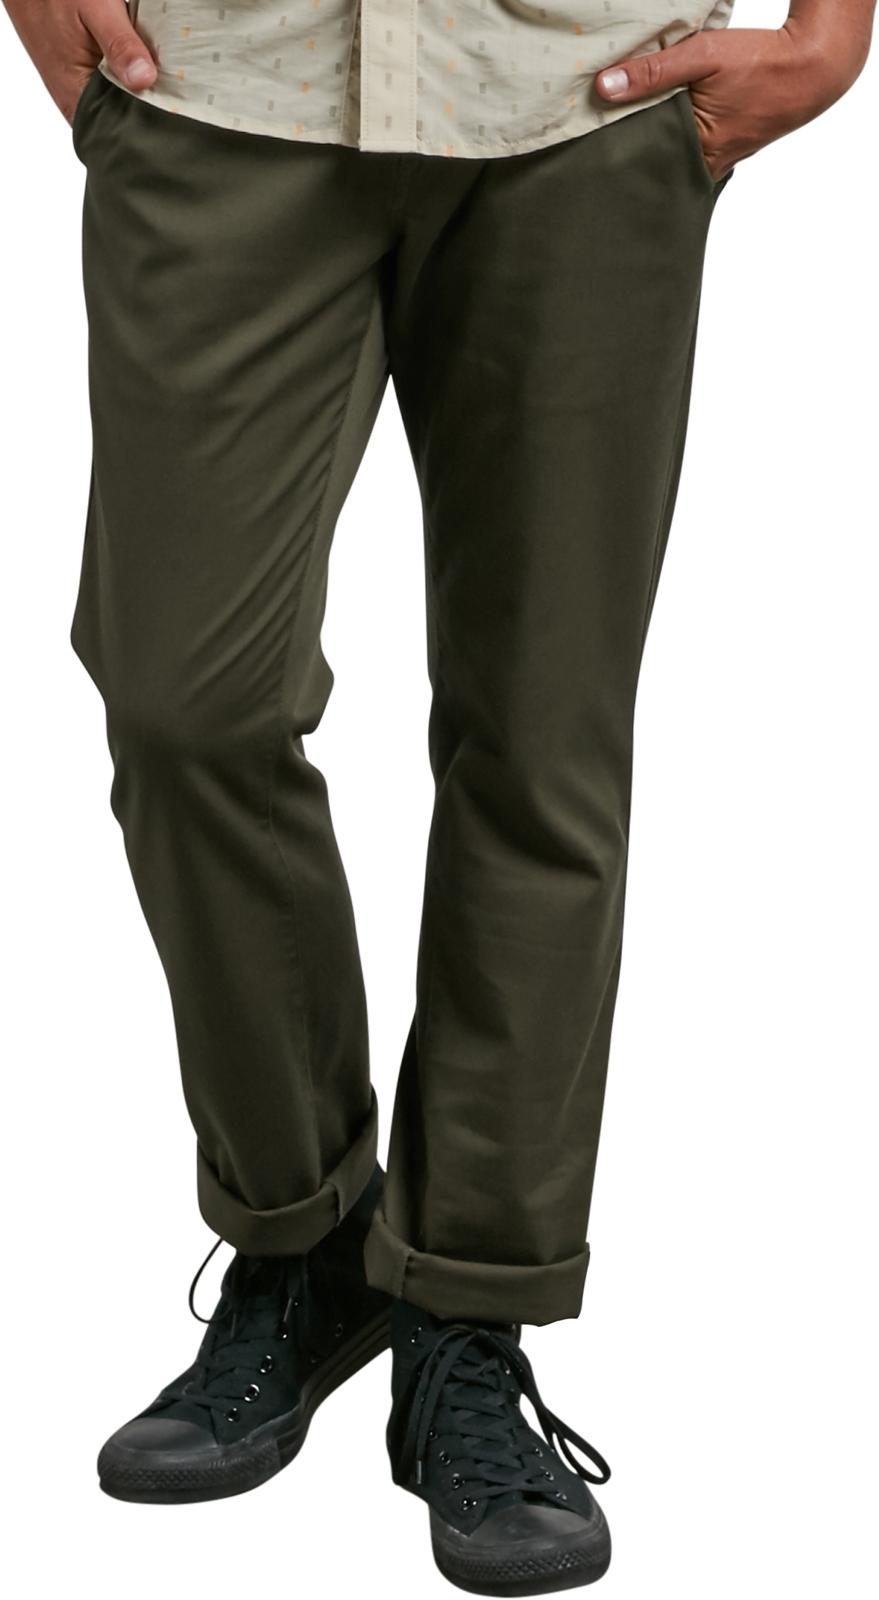 b6a99ca9 Volcom Frickin Modern Stret Chino Trousers in Seaweed Green | hardcloud.com